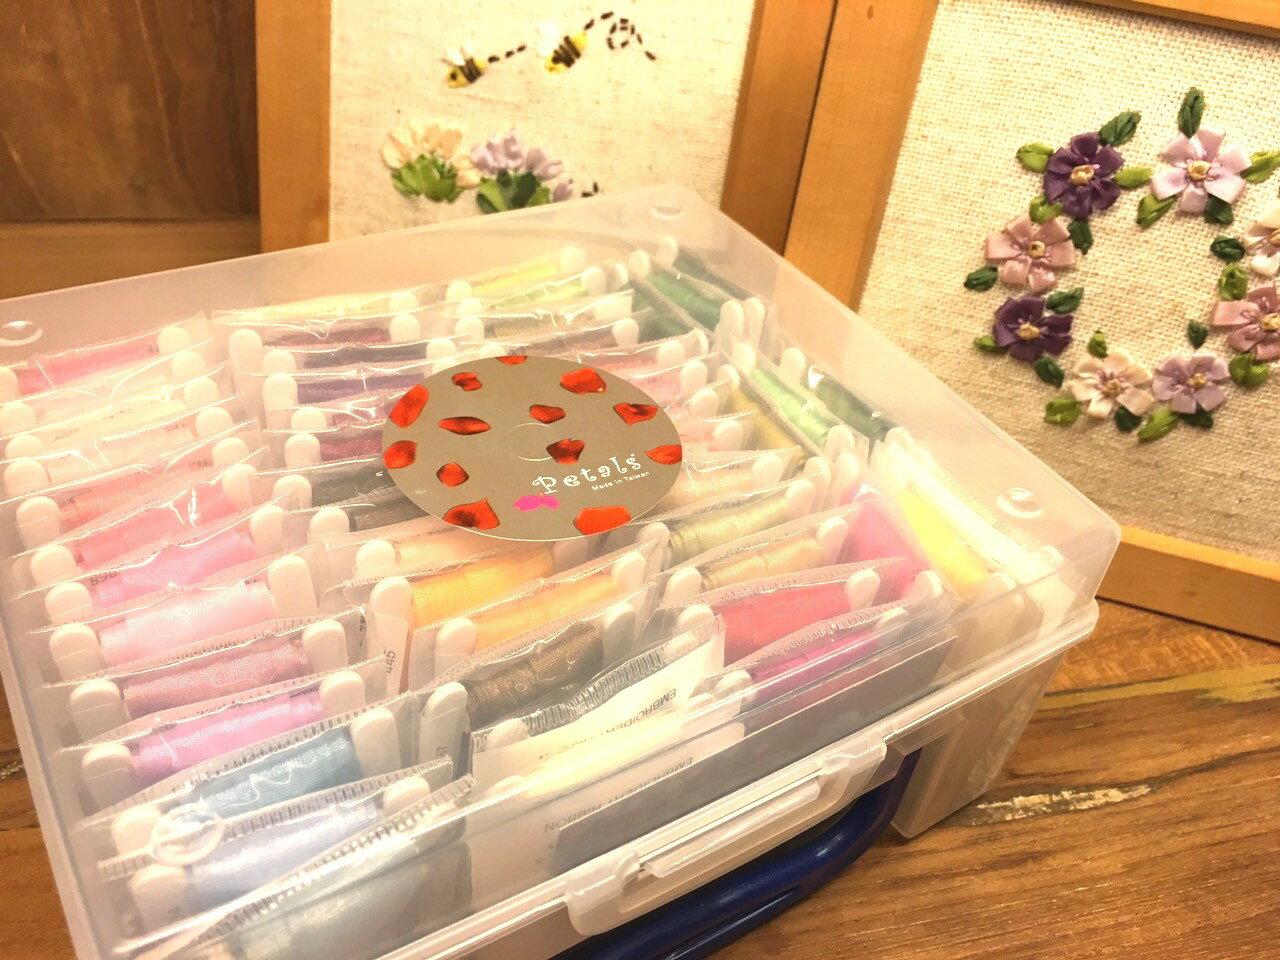 Petals緞帶刺繡盒裝 - 1045 仿絲帶全彩 8mm 49色 - 限時優惠好康折扣